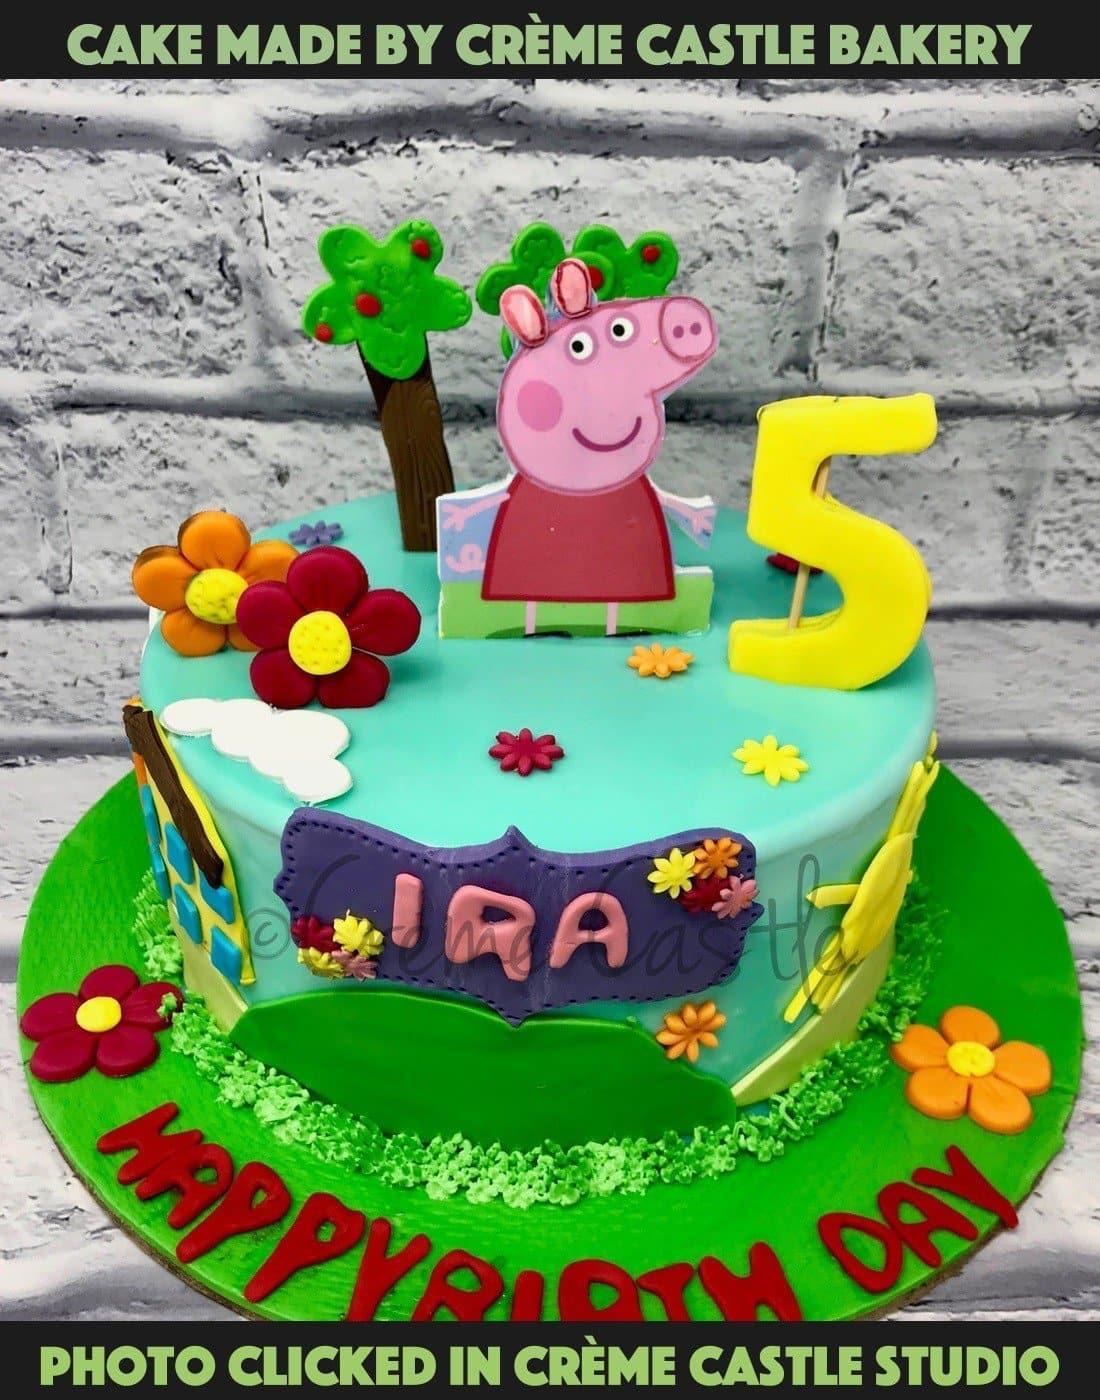 Peppa Pig Theme Cake Order Cake Online Gurugram Noida And Greater Noida Creme Castle